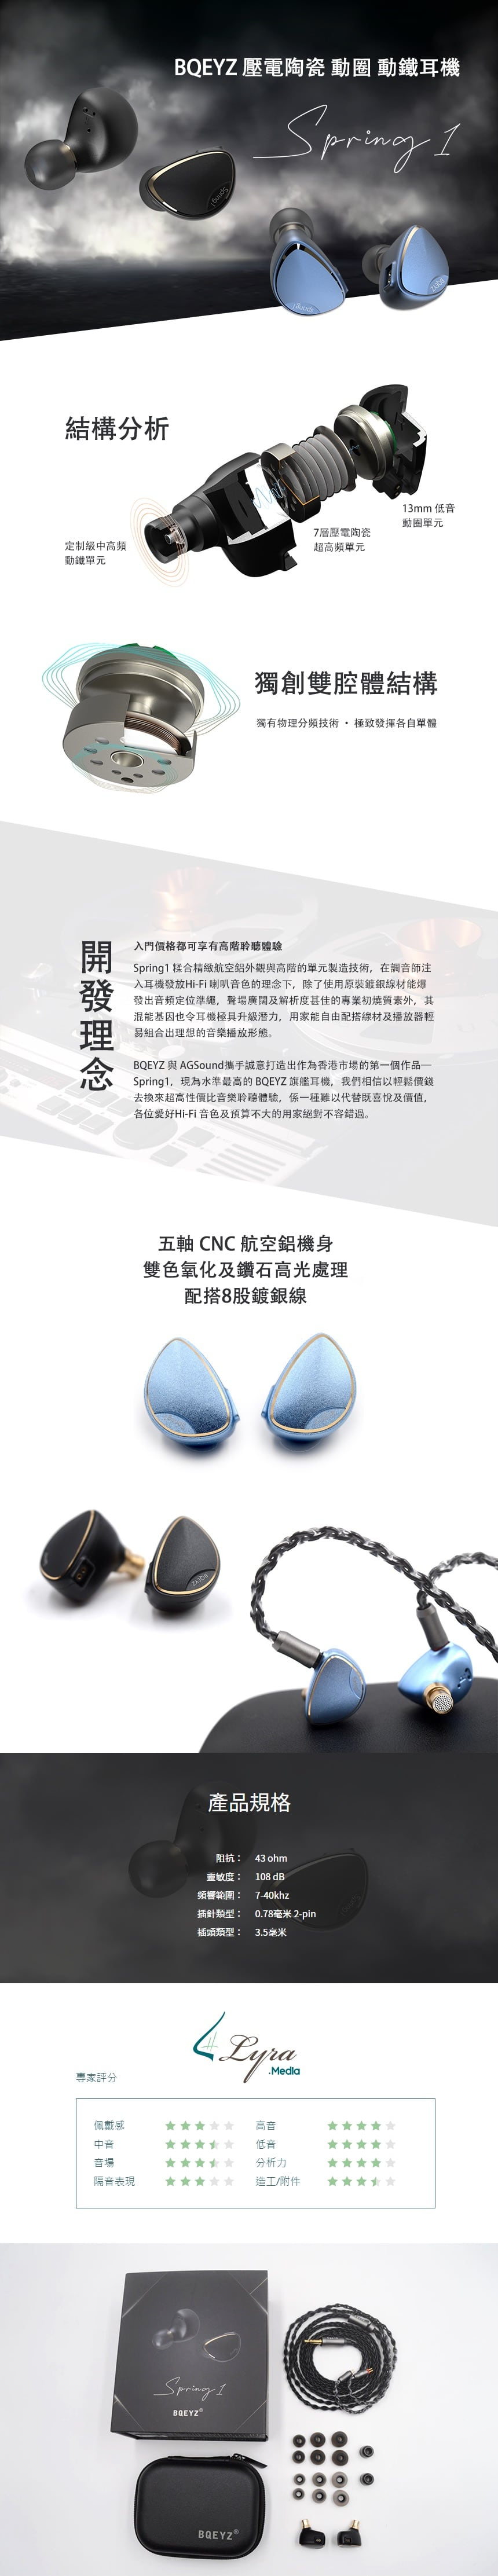 BQEYZ Spring 1 壓電陶瓷 動圈 動鐵 混合三單元 監聽耳機